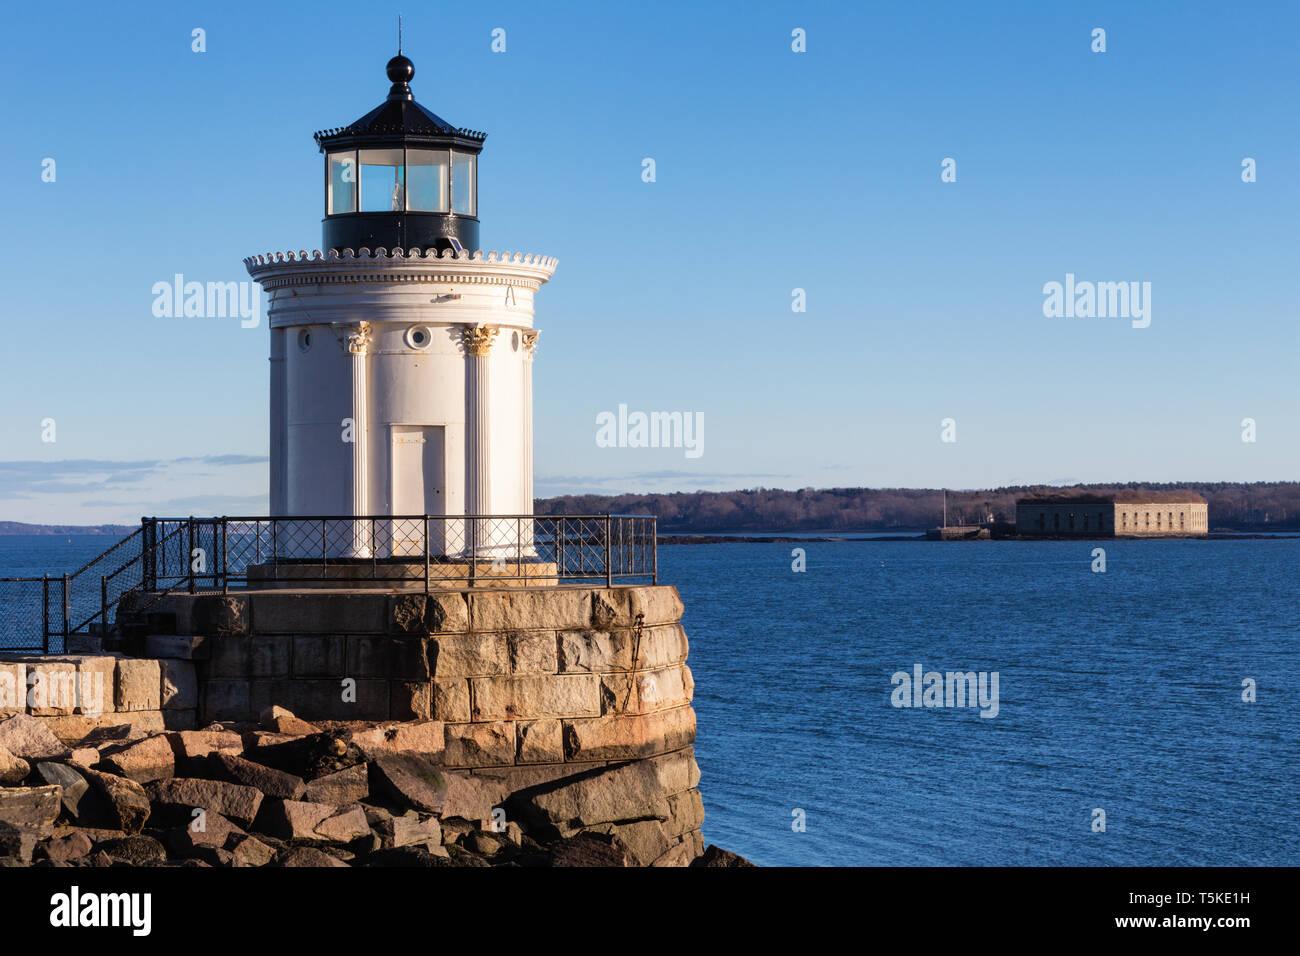 Portland Breakwater Lighthouse (Bug Light), South Portland, Maine - Stock Image